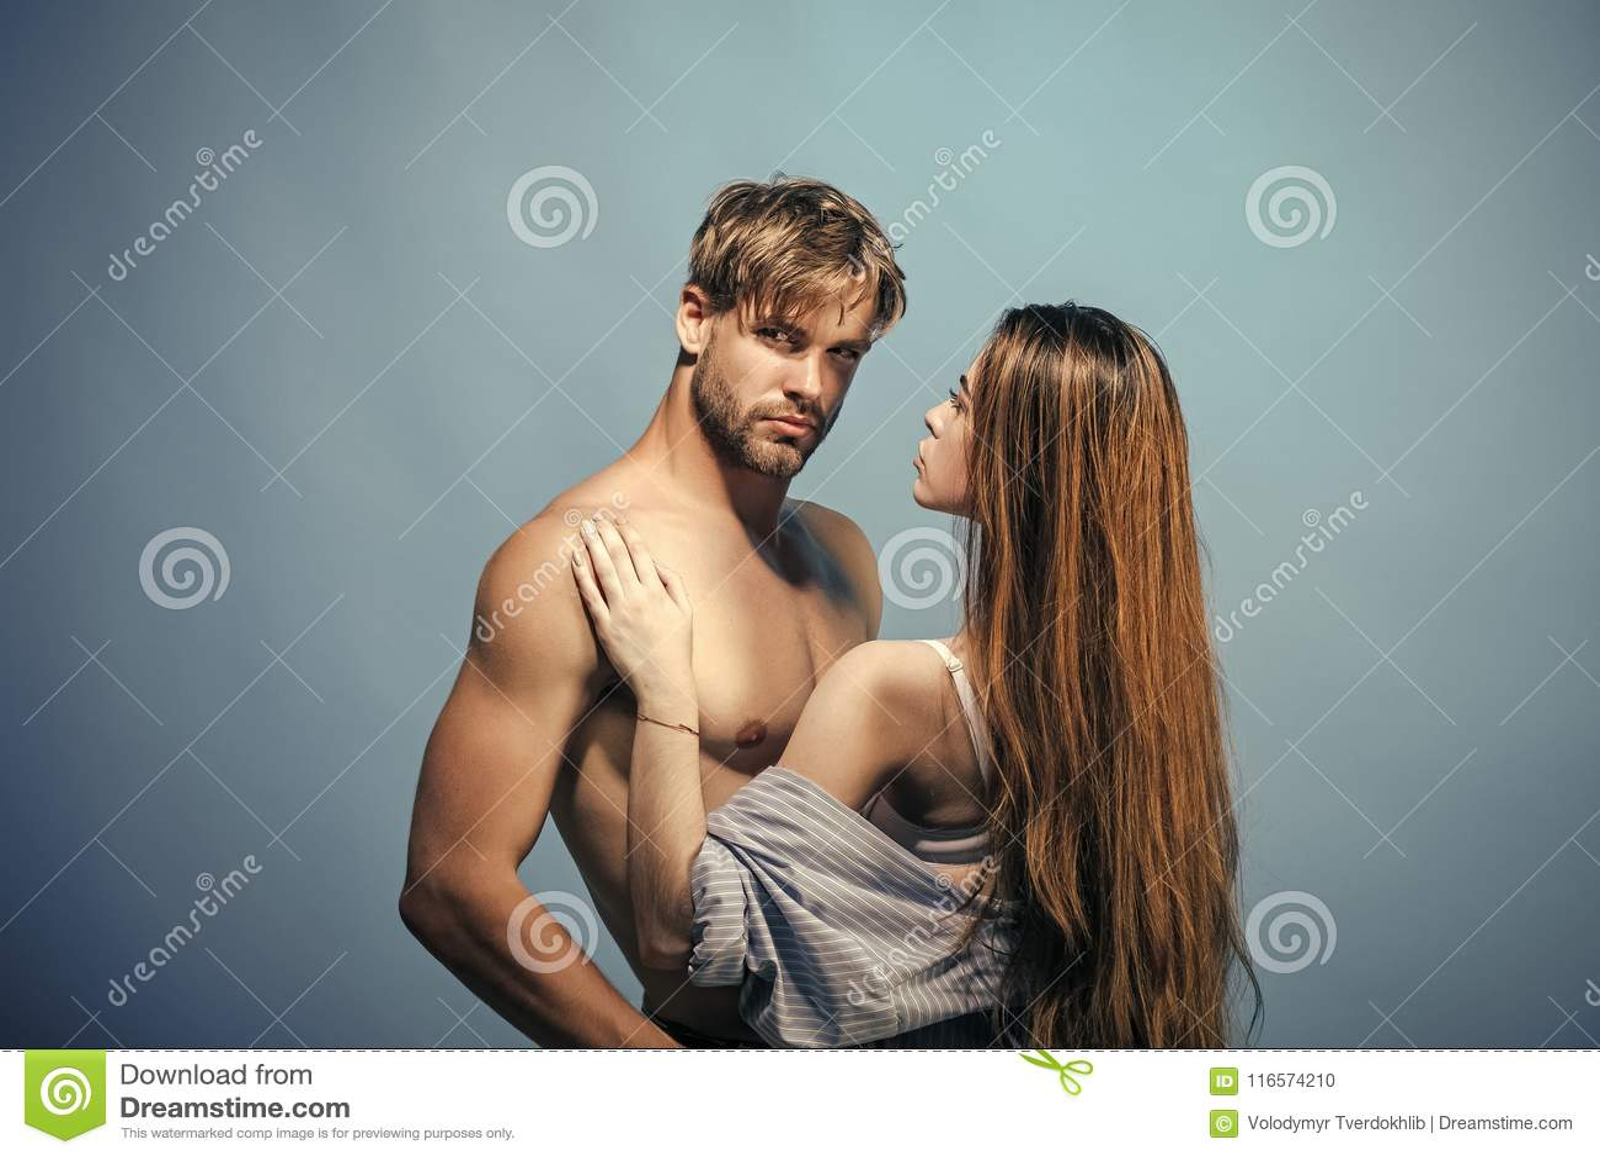 apologise, cute amateur girl masturbate brunette apologise, but, opinion